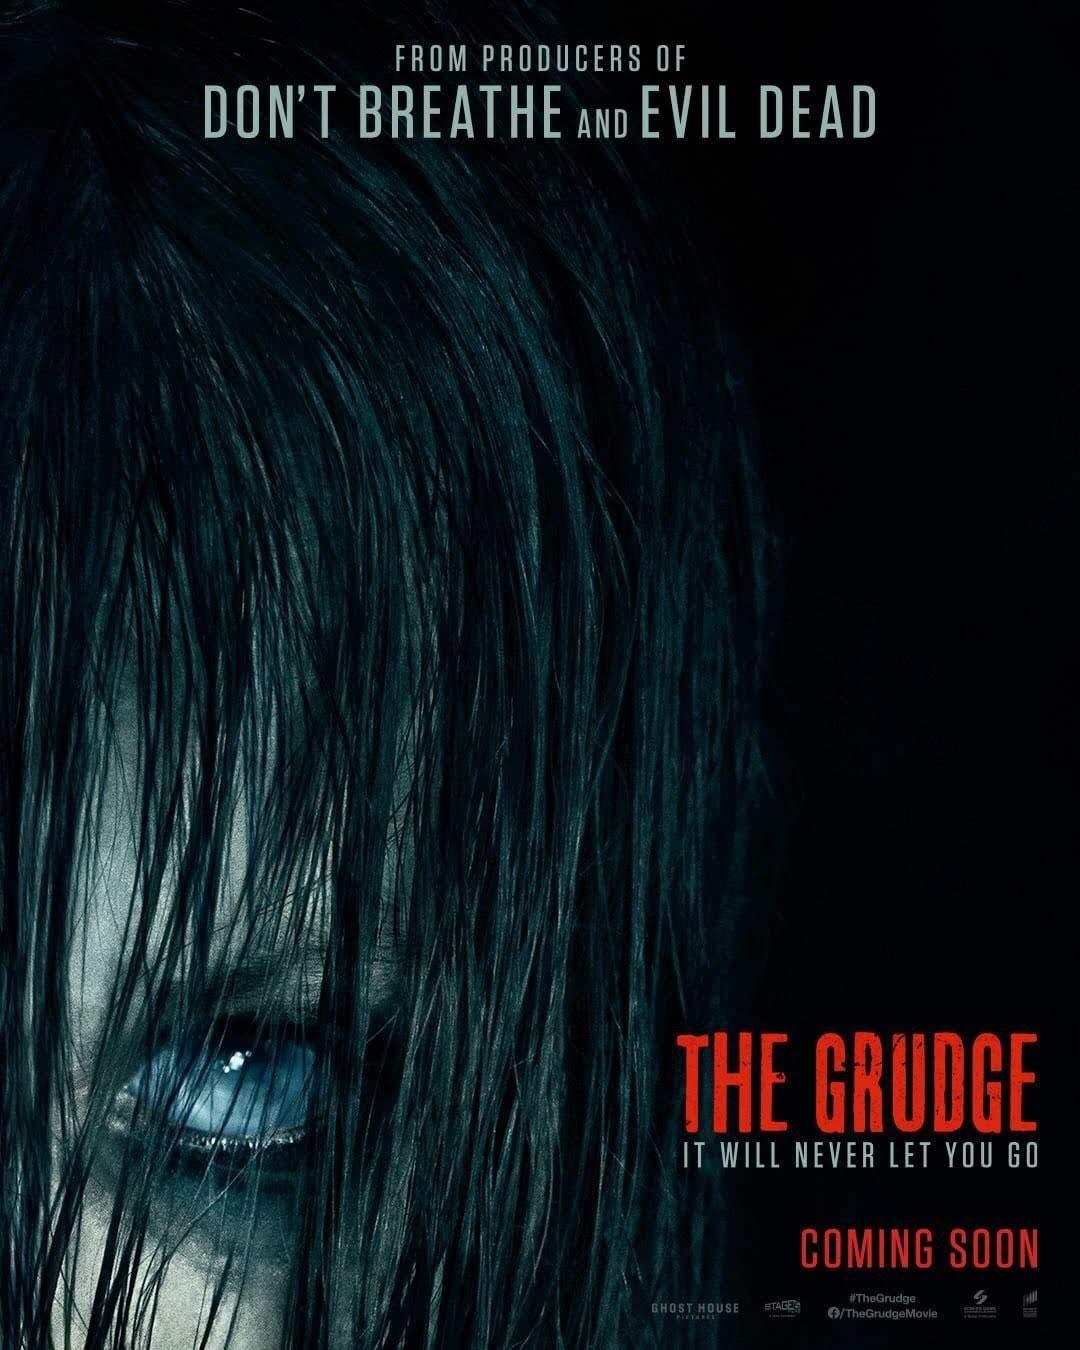 New Poster for The Grudge : ハリウッド版「呪怨」の最新作「ザ・グラッジ」の新しい伽椰子さんポスター ! !